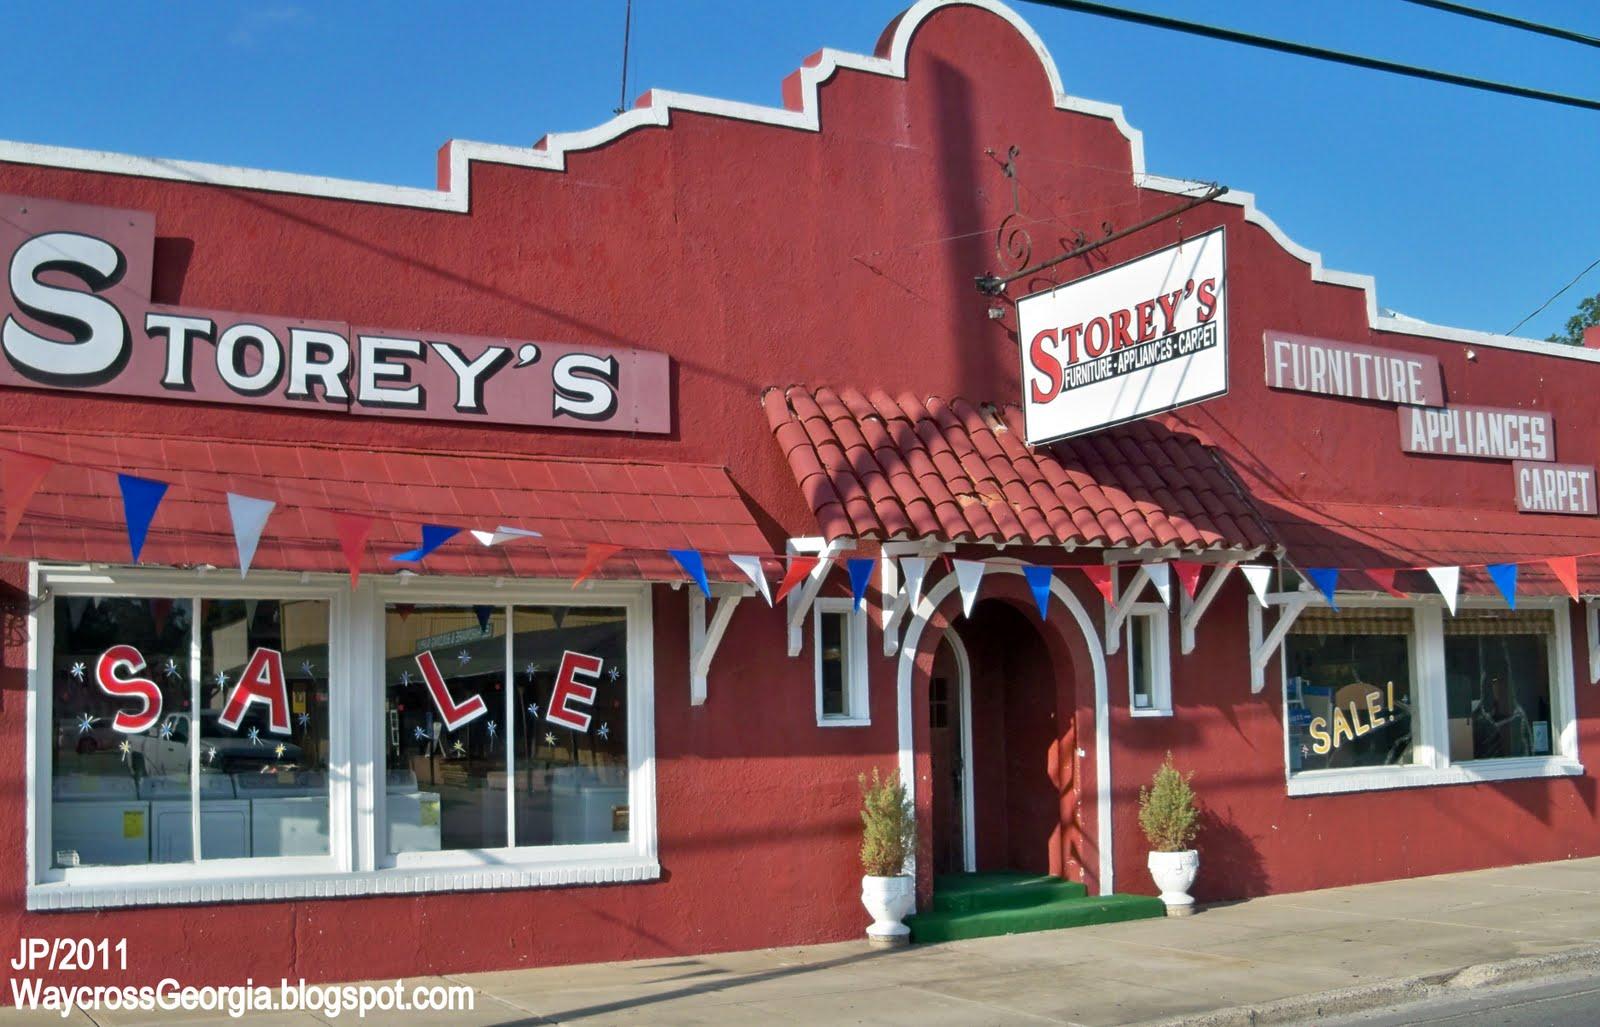 STOREYu0027S WAYCROSS GEORGIA, Storeyu0027s Furniture Appliances Carpet Store  Waycross GA. Ware County